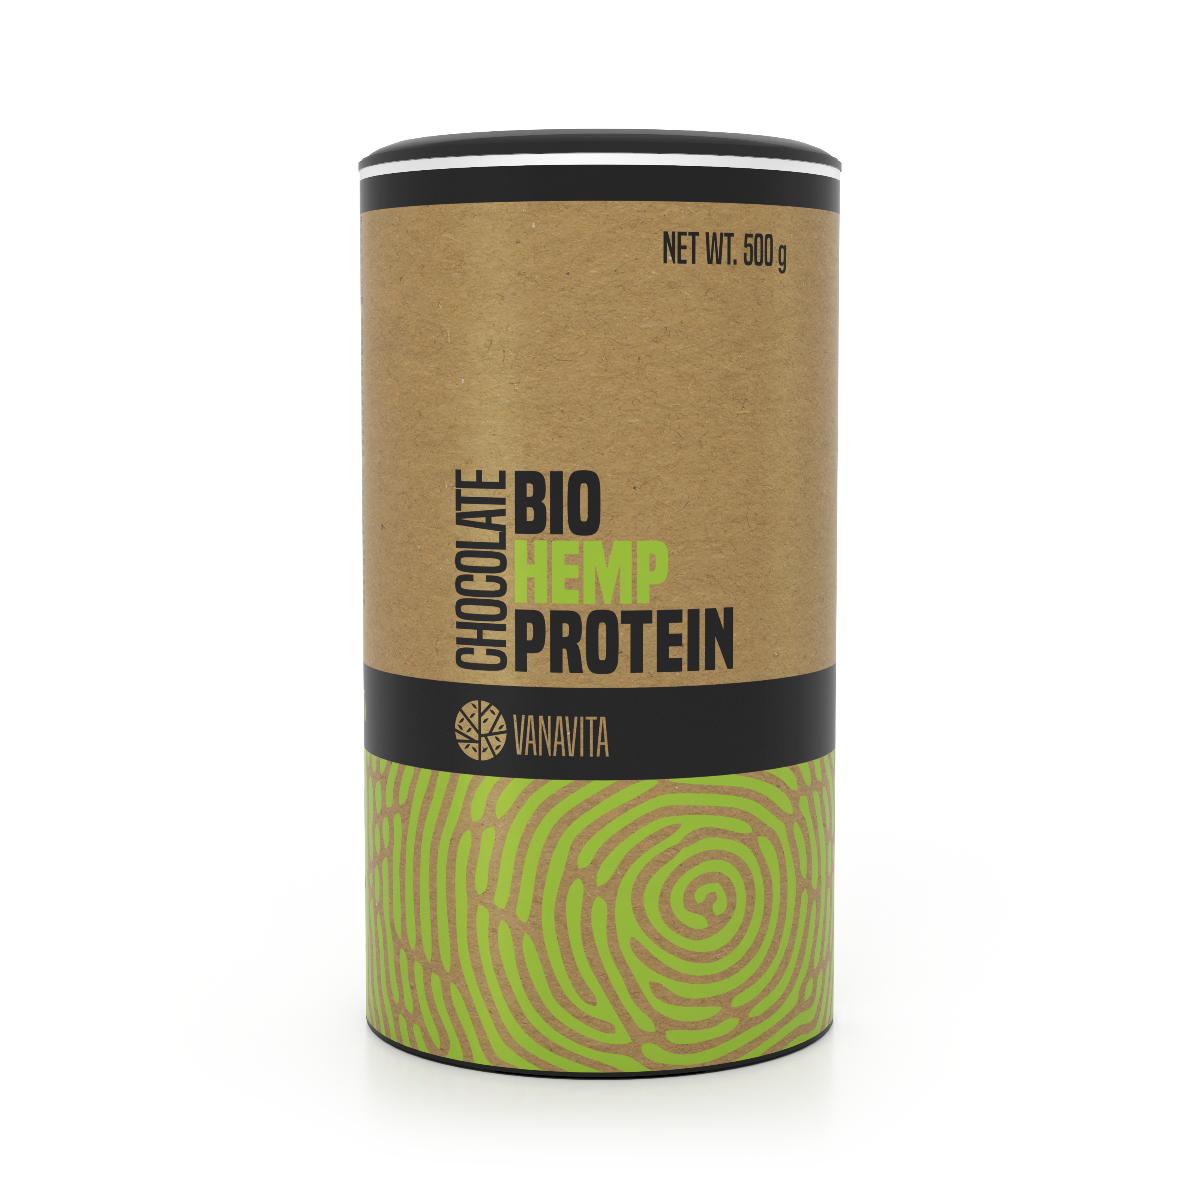 BIO Konopný proteín - VanaVita - VanaVita BIO Konopný proteín 500 g